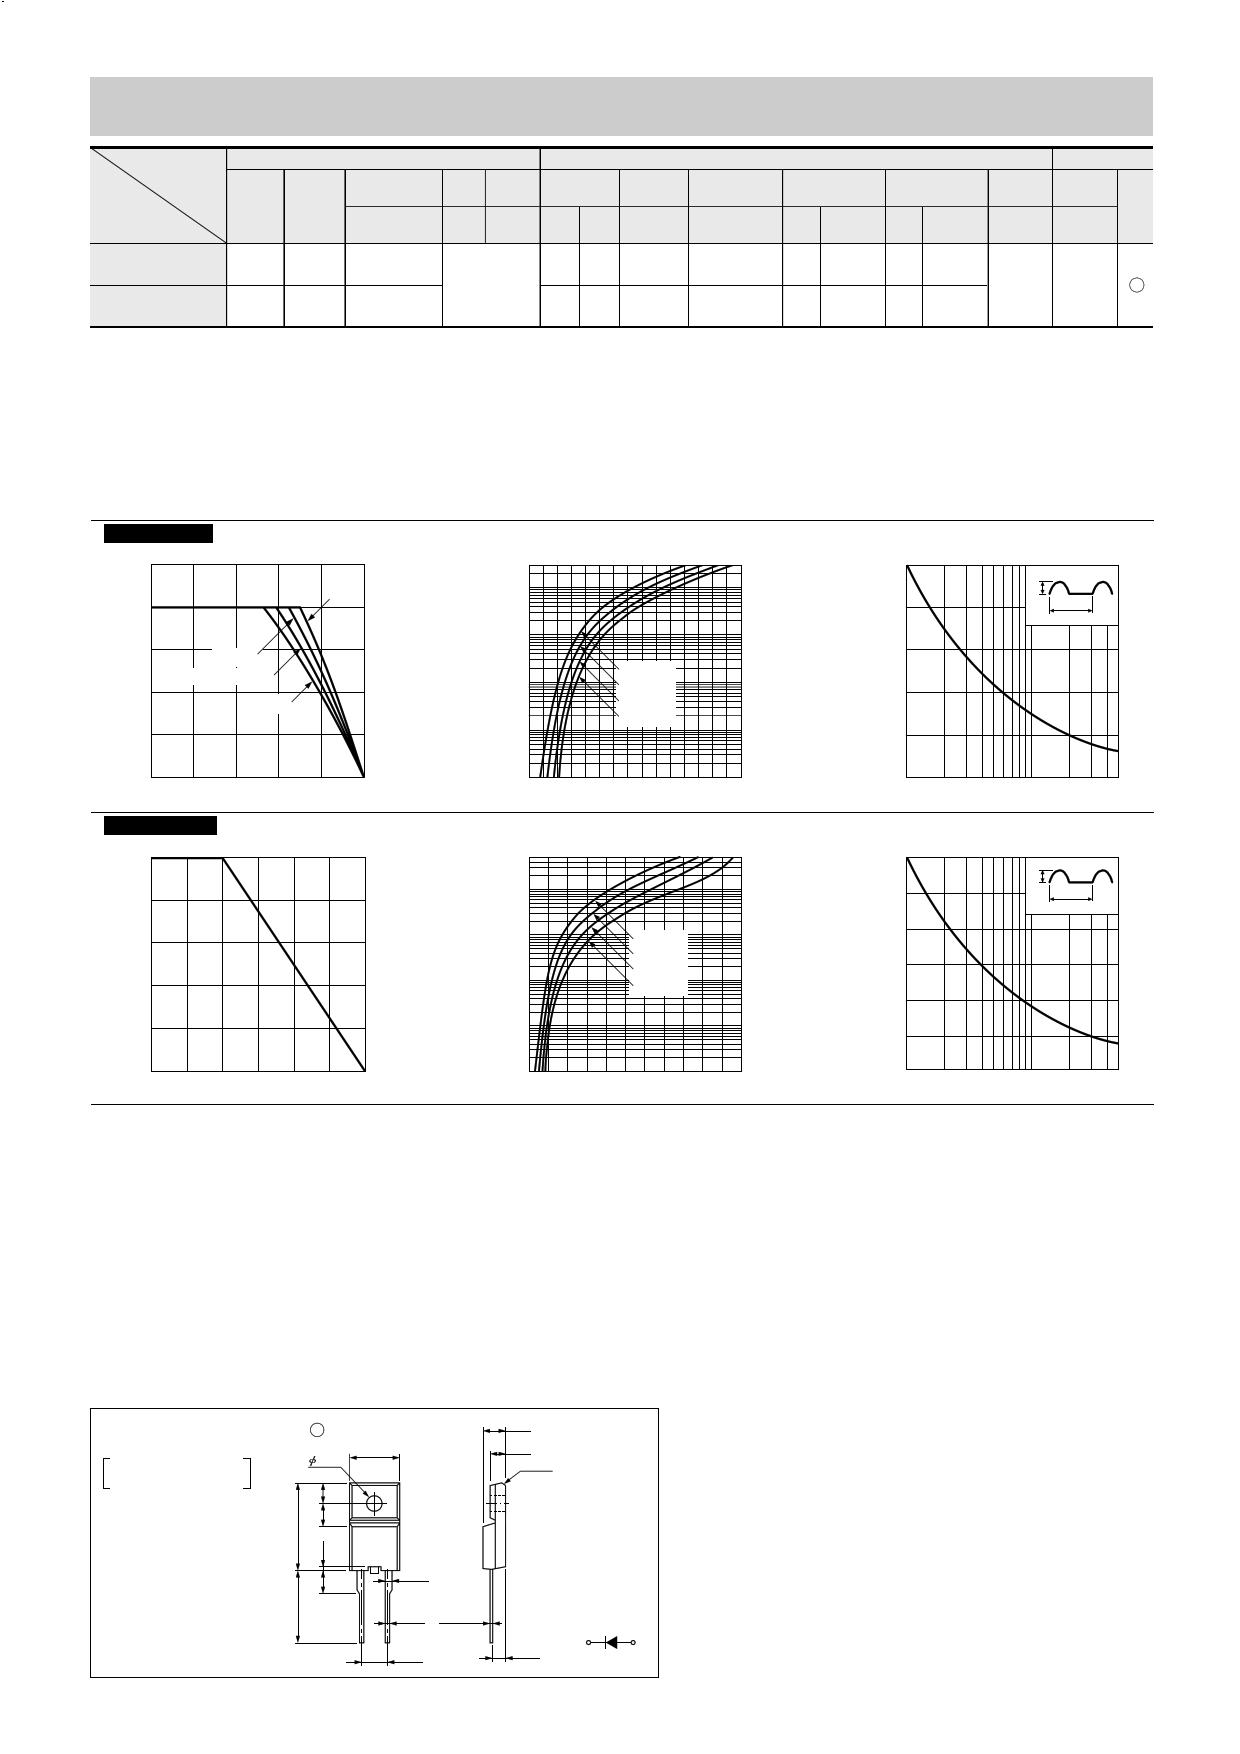 FMGG26S دیتاشیت PDF